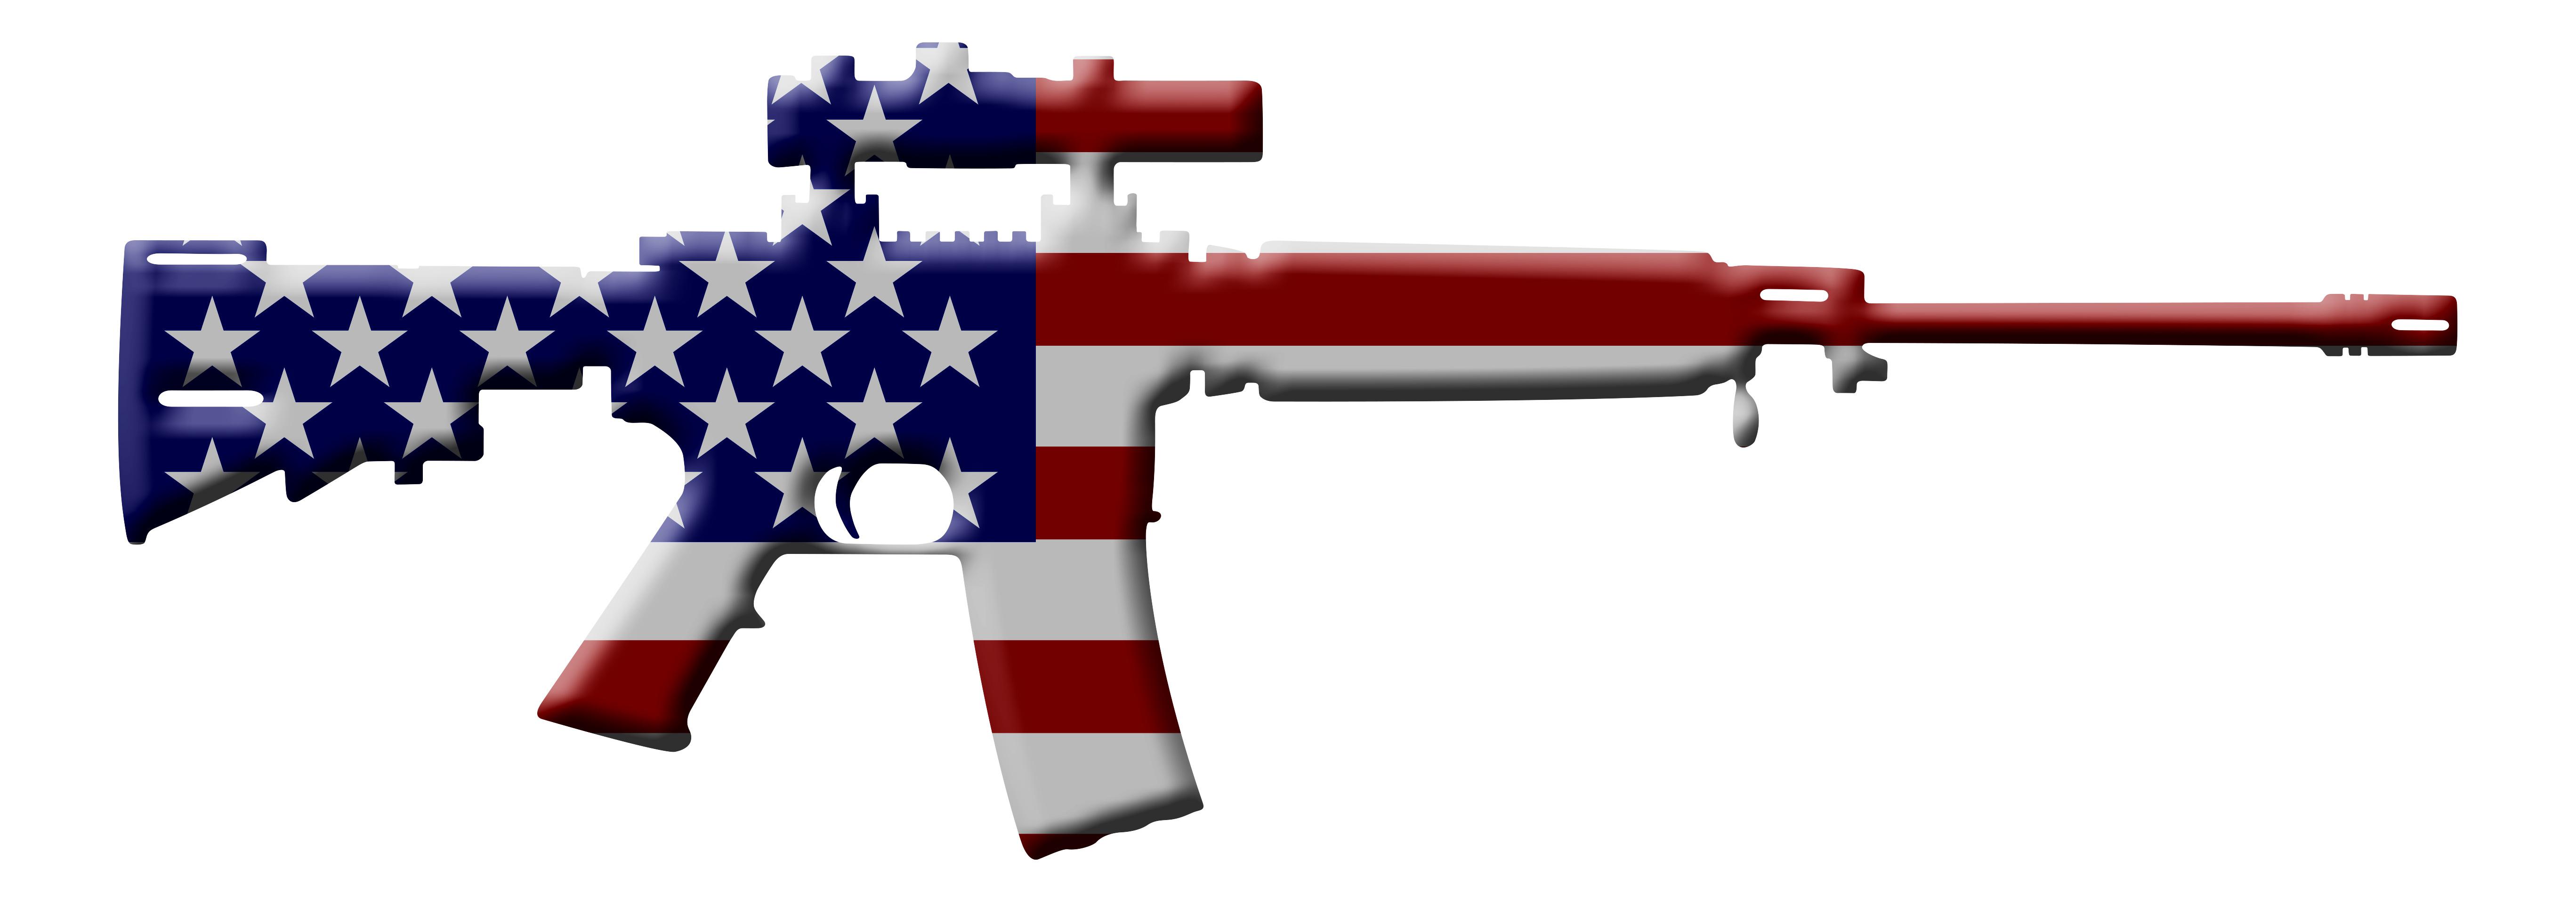 pros cons gun control the wise sloth gun control america